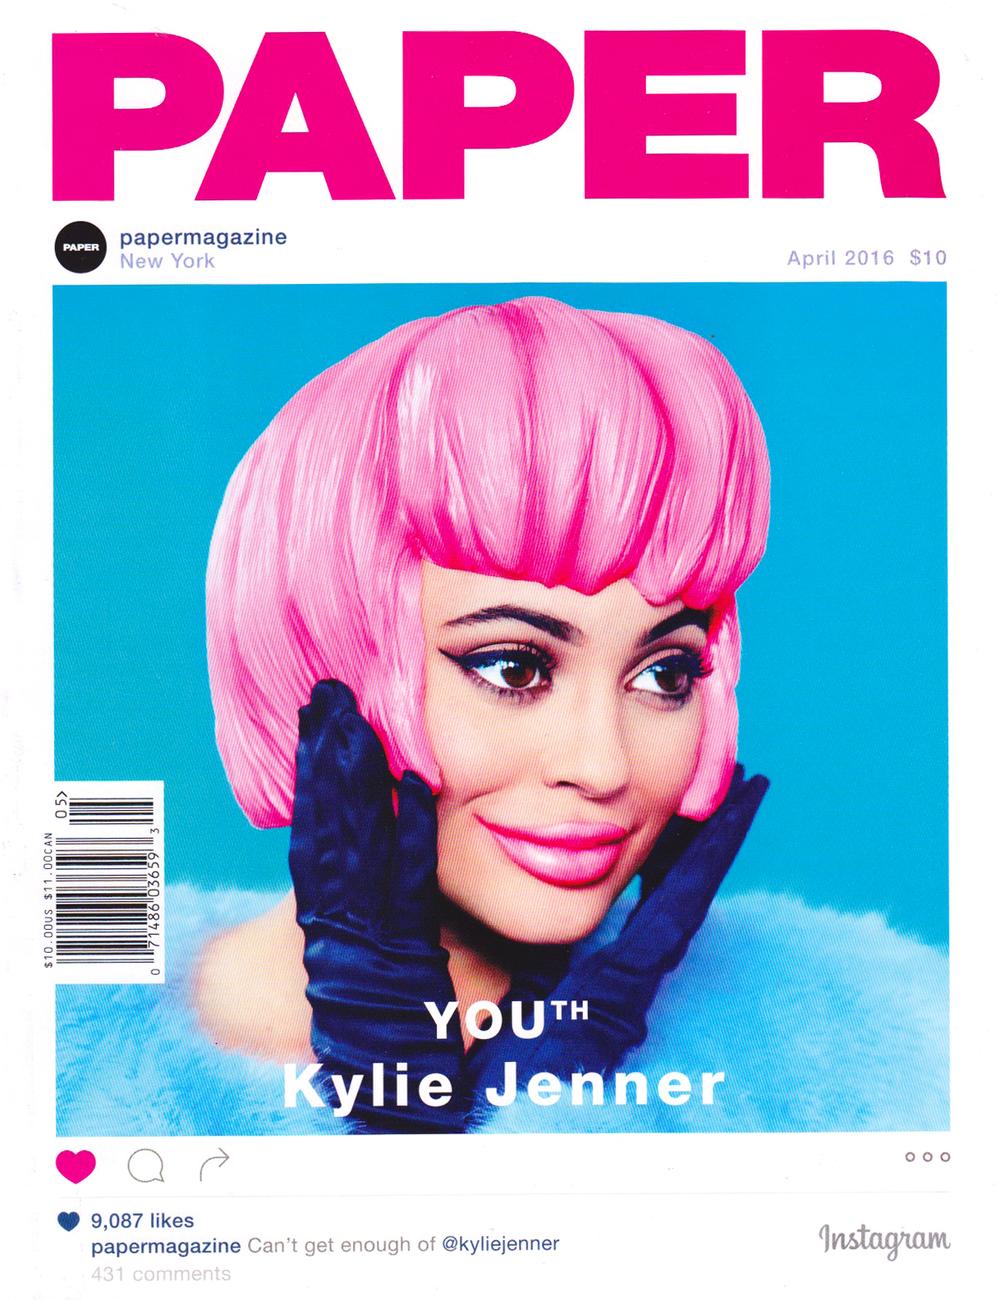 PAPER MAG Jovana Djuric Kylie Jenner Cover.jpeg